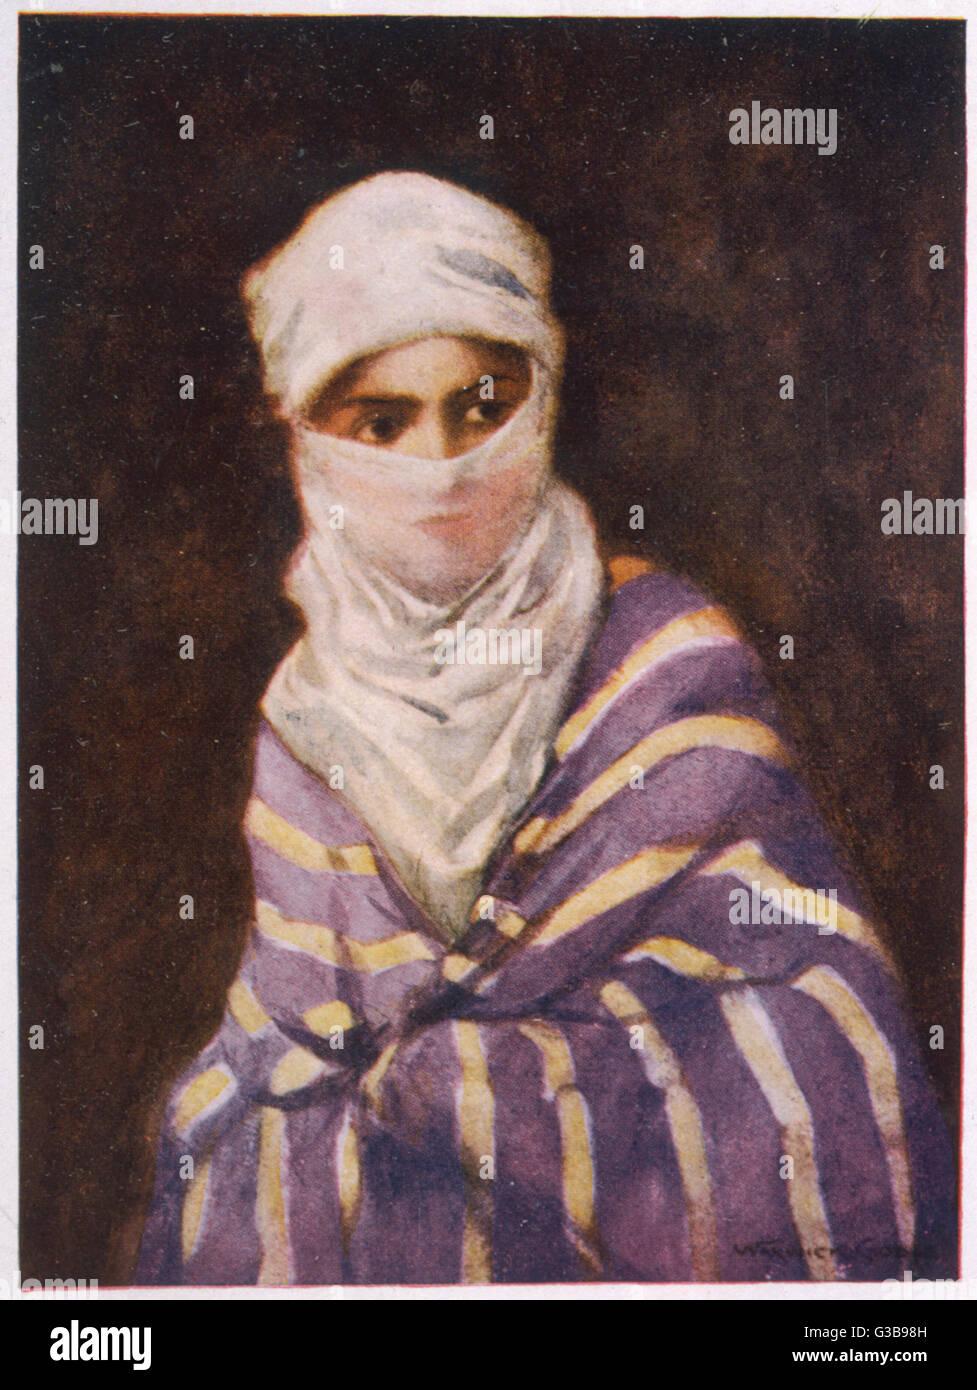 Turkish woman in a Yashmak        Date: 1906 - Stock Image